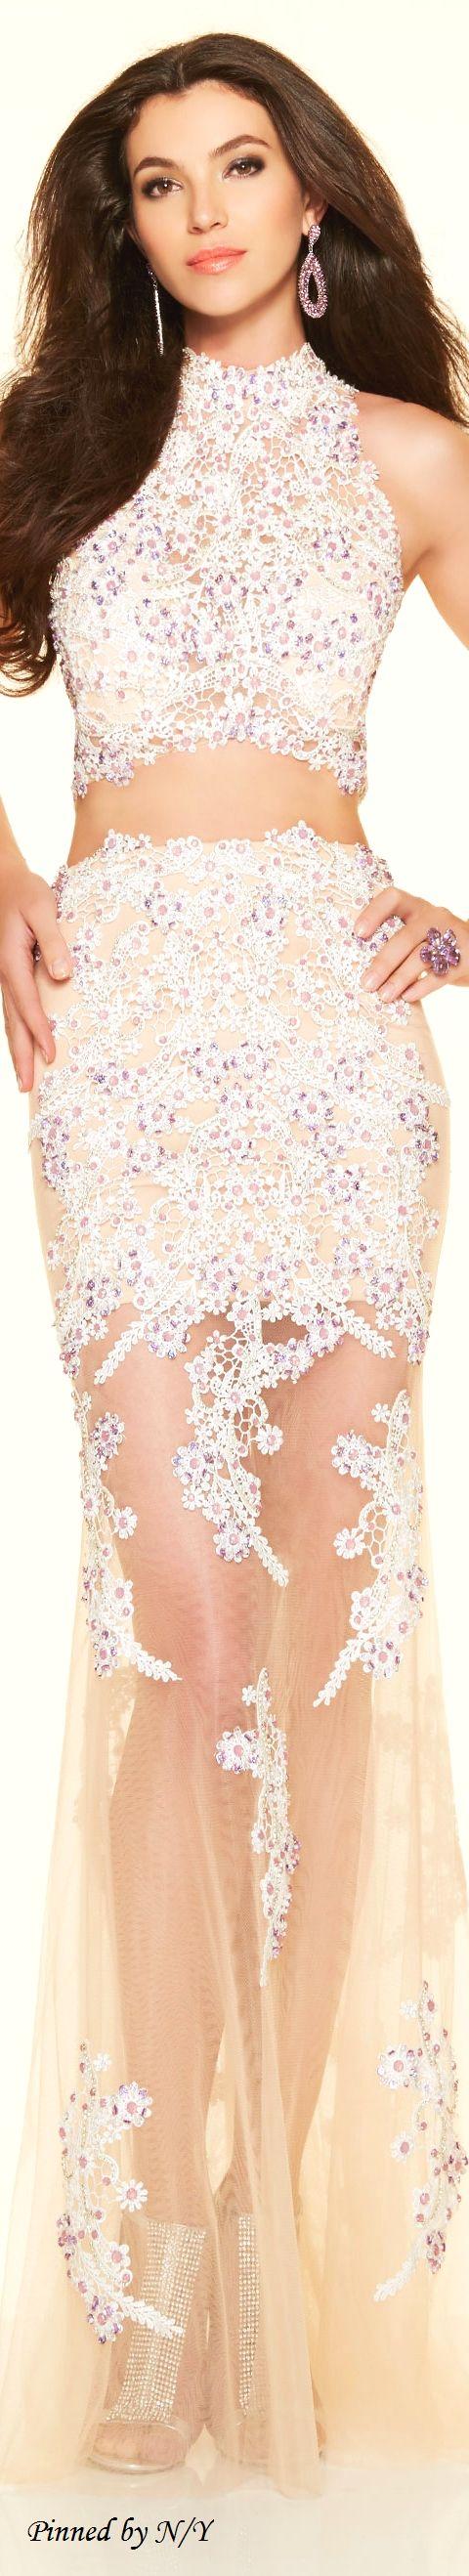 Mori Lee Prom Dress II N/Y